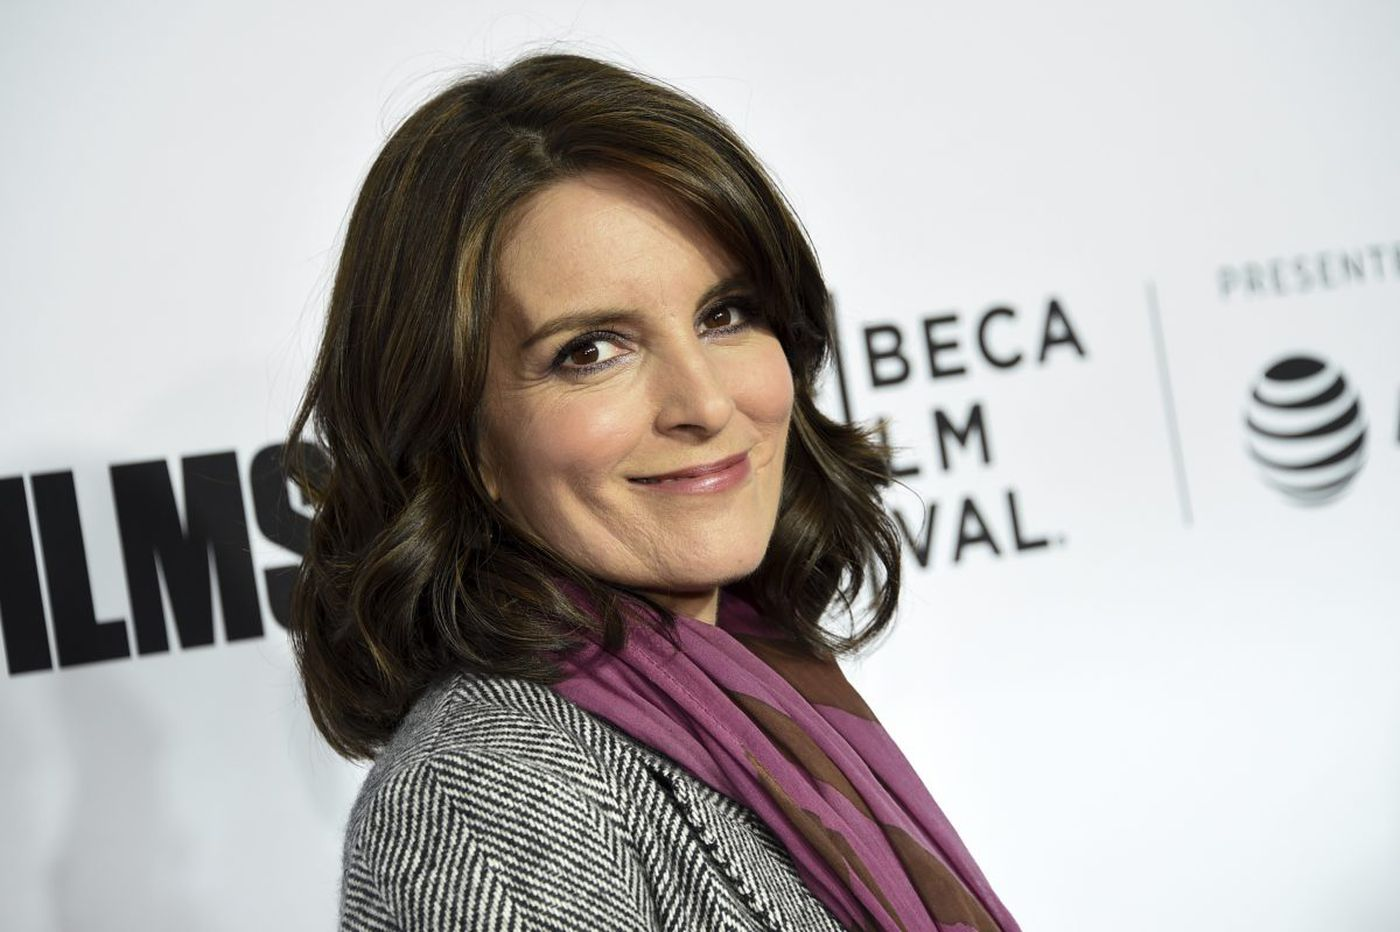 Tina Fey to host season finale of 'Saturday Night Live'